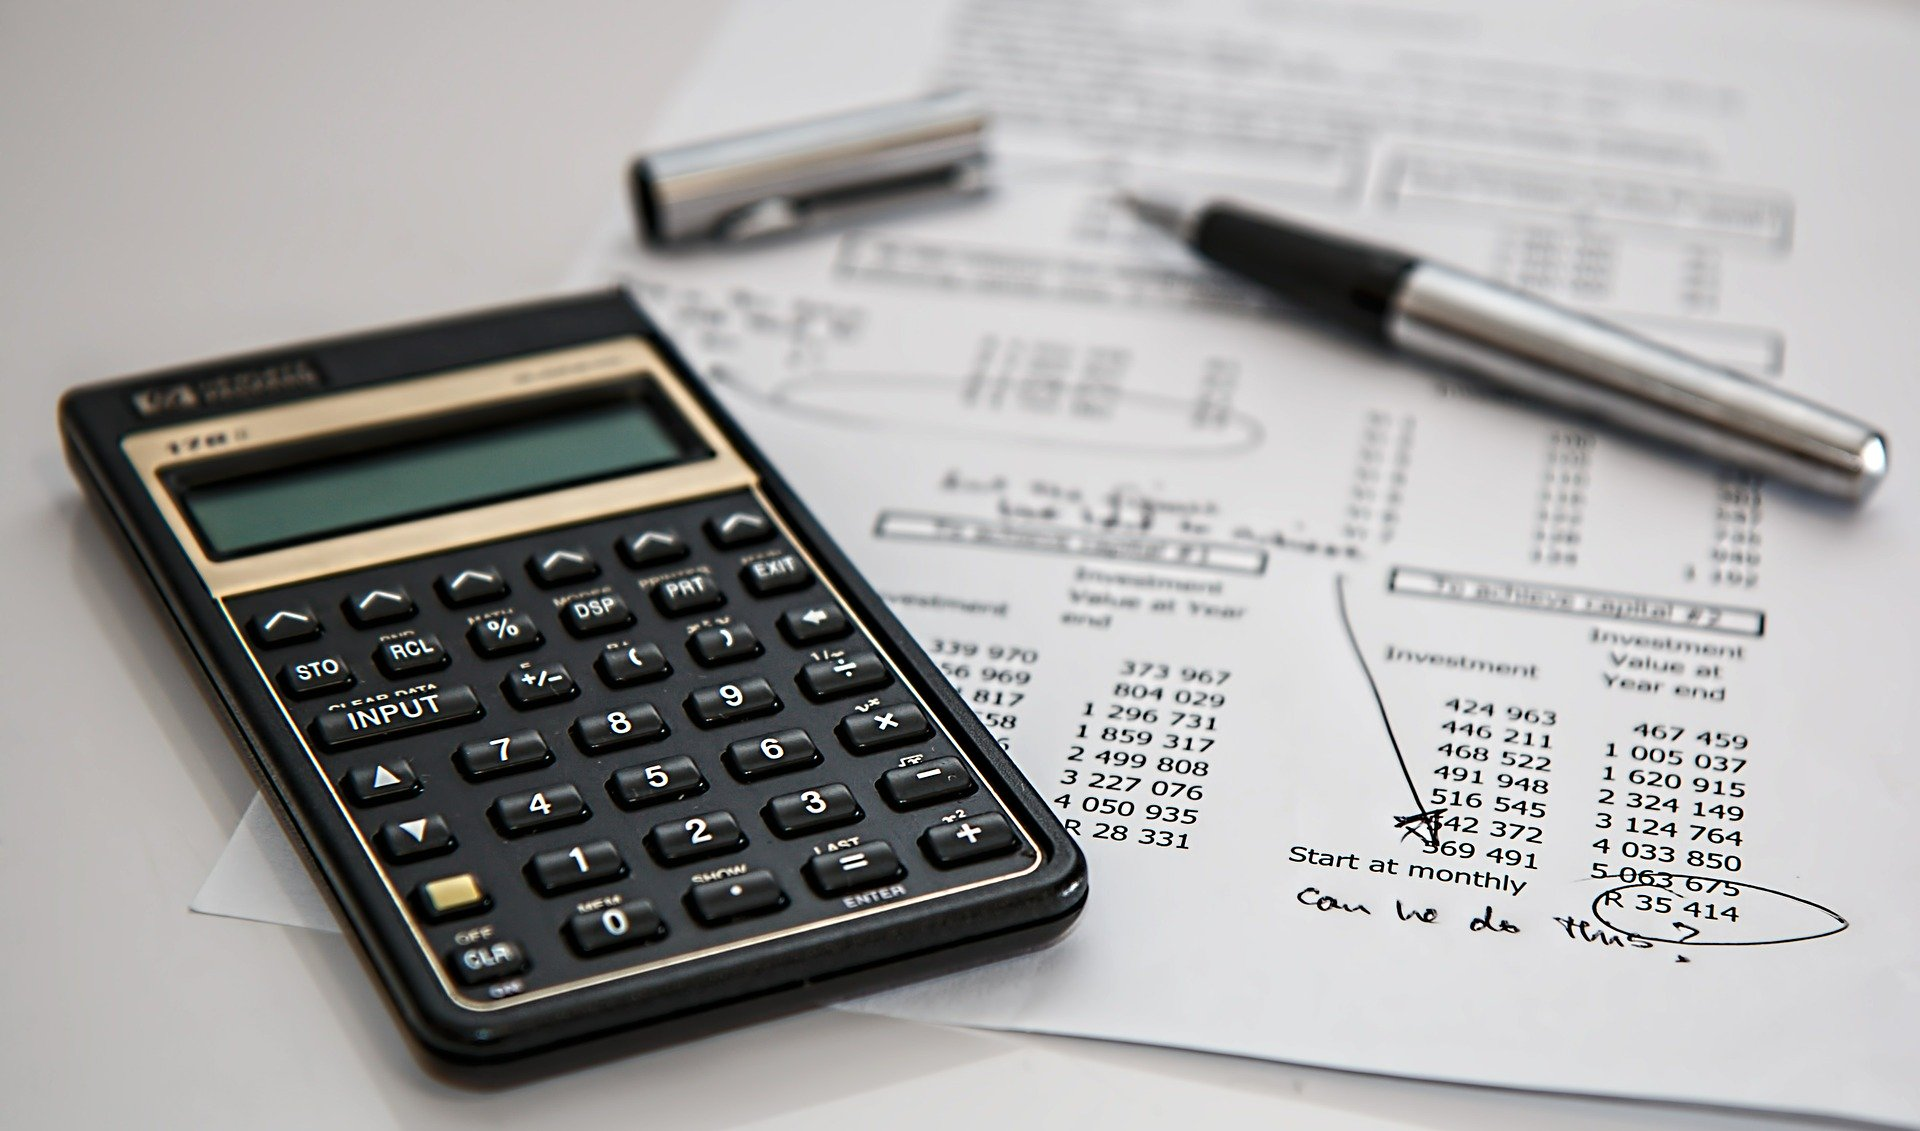 maneras de reducir la cuota de la hipoteca